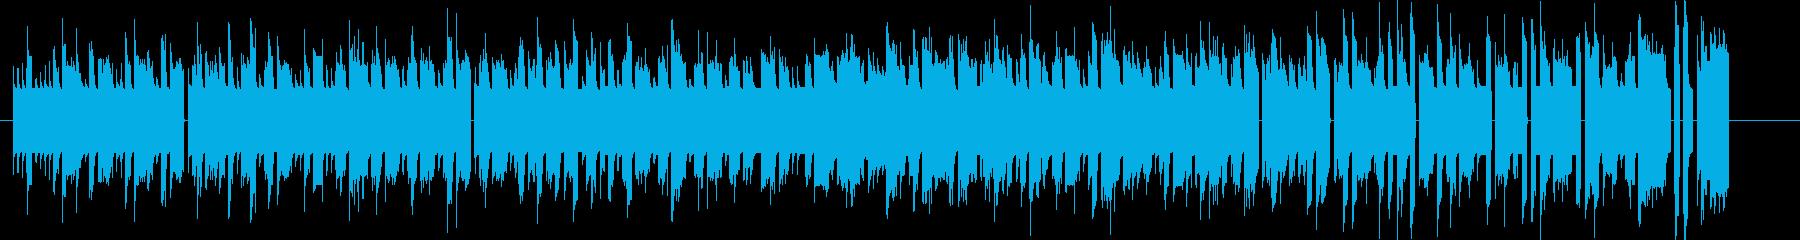 Bitシンセによる暖かなファミコンBGMの再生済みの波形